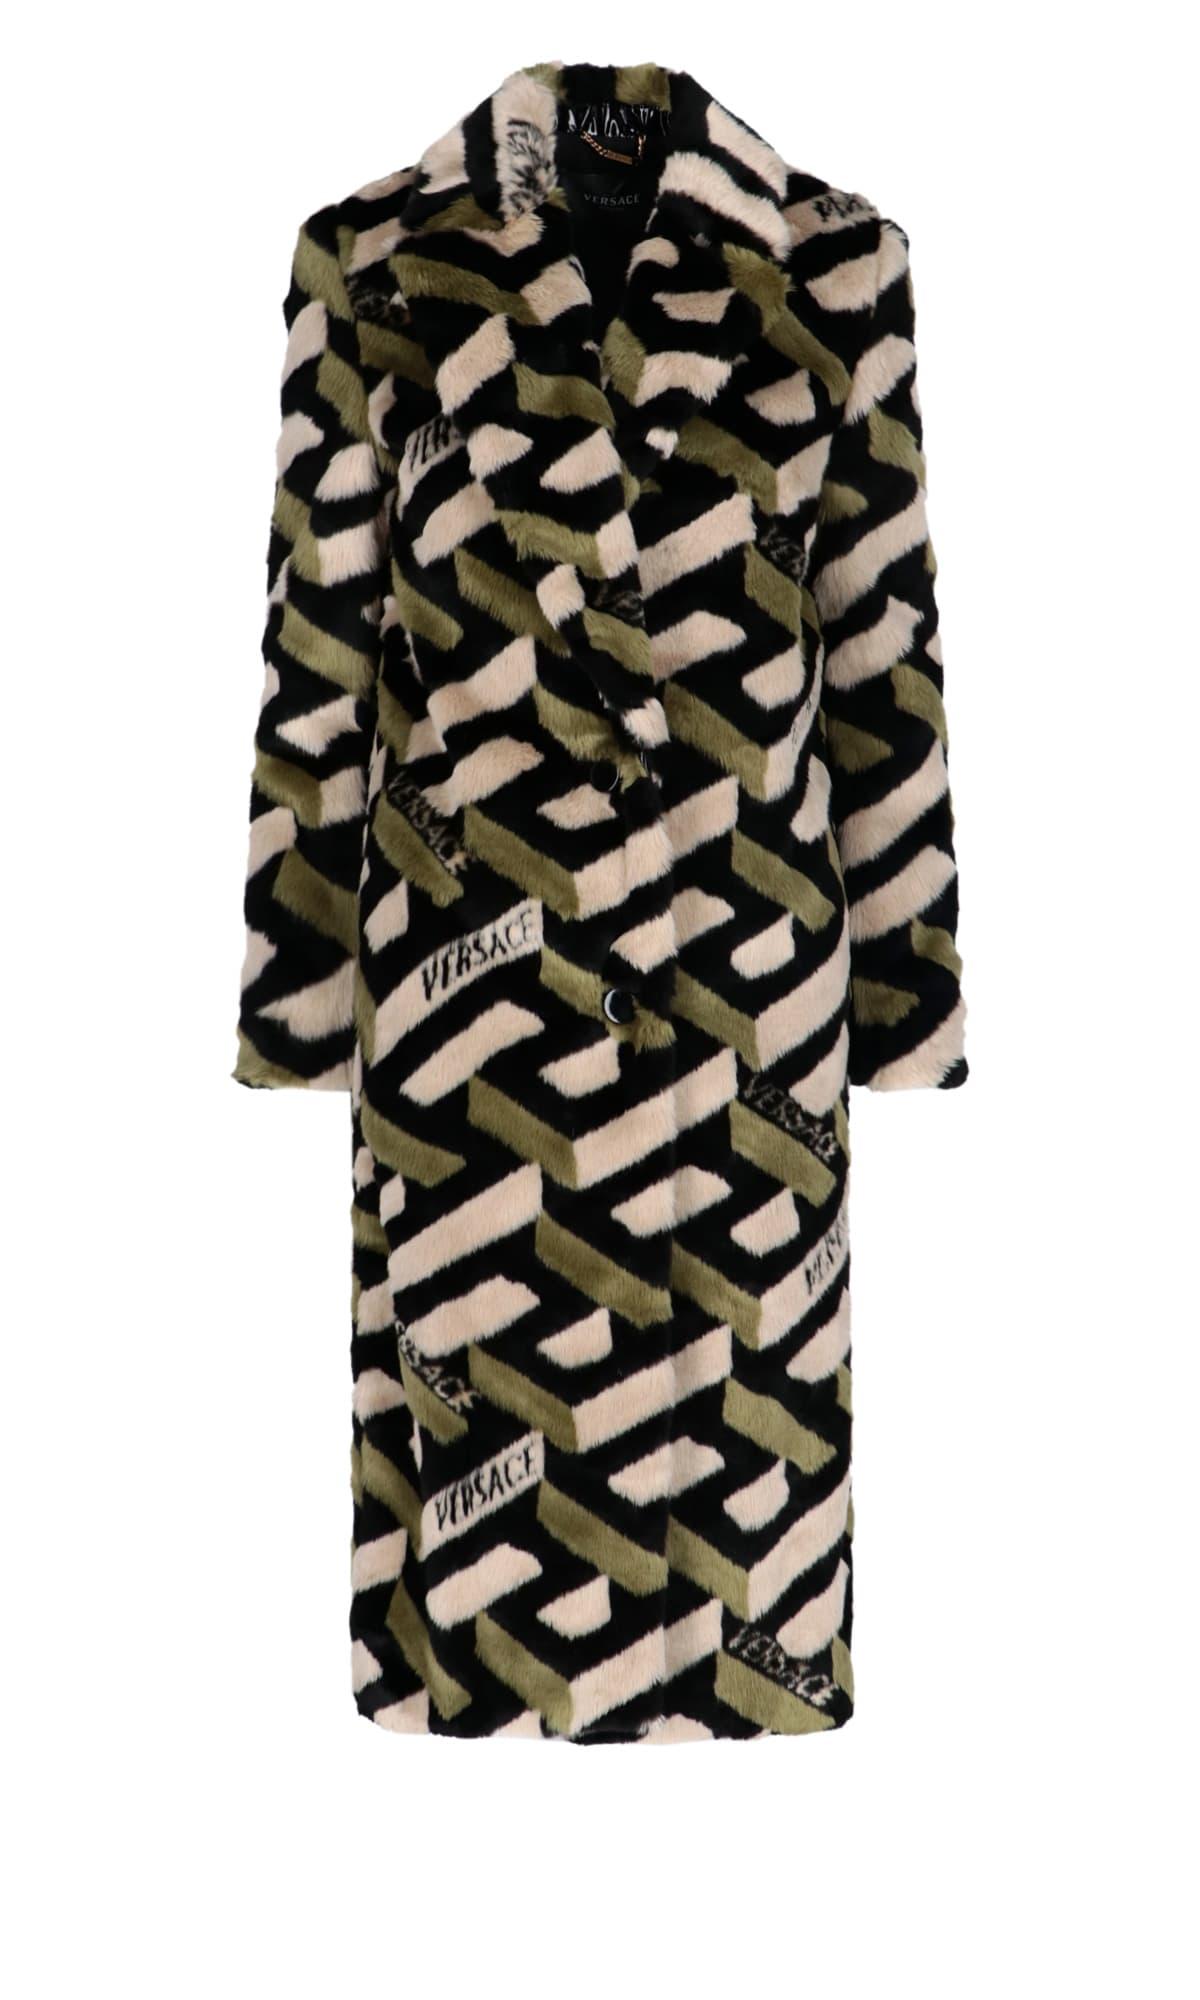 Versace Jacket In Black